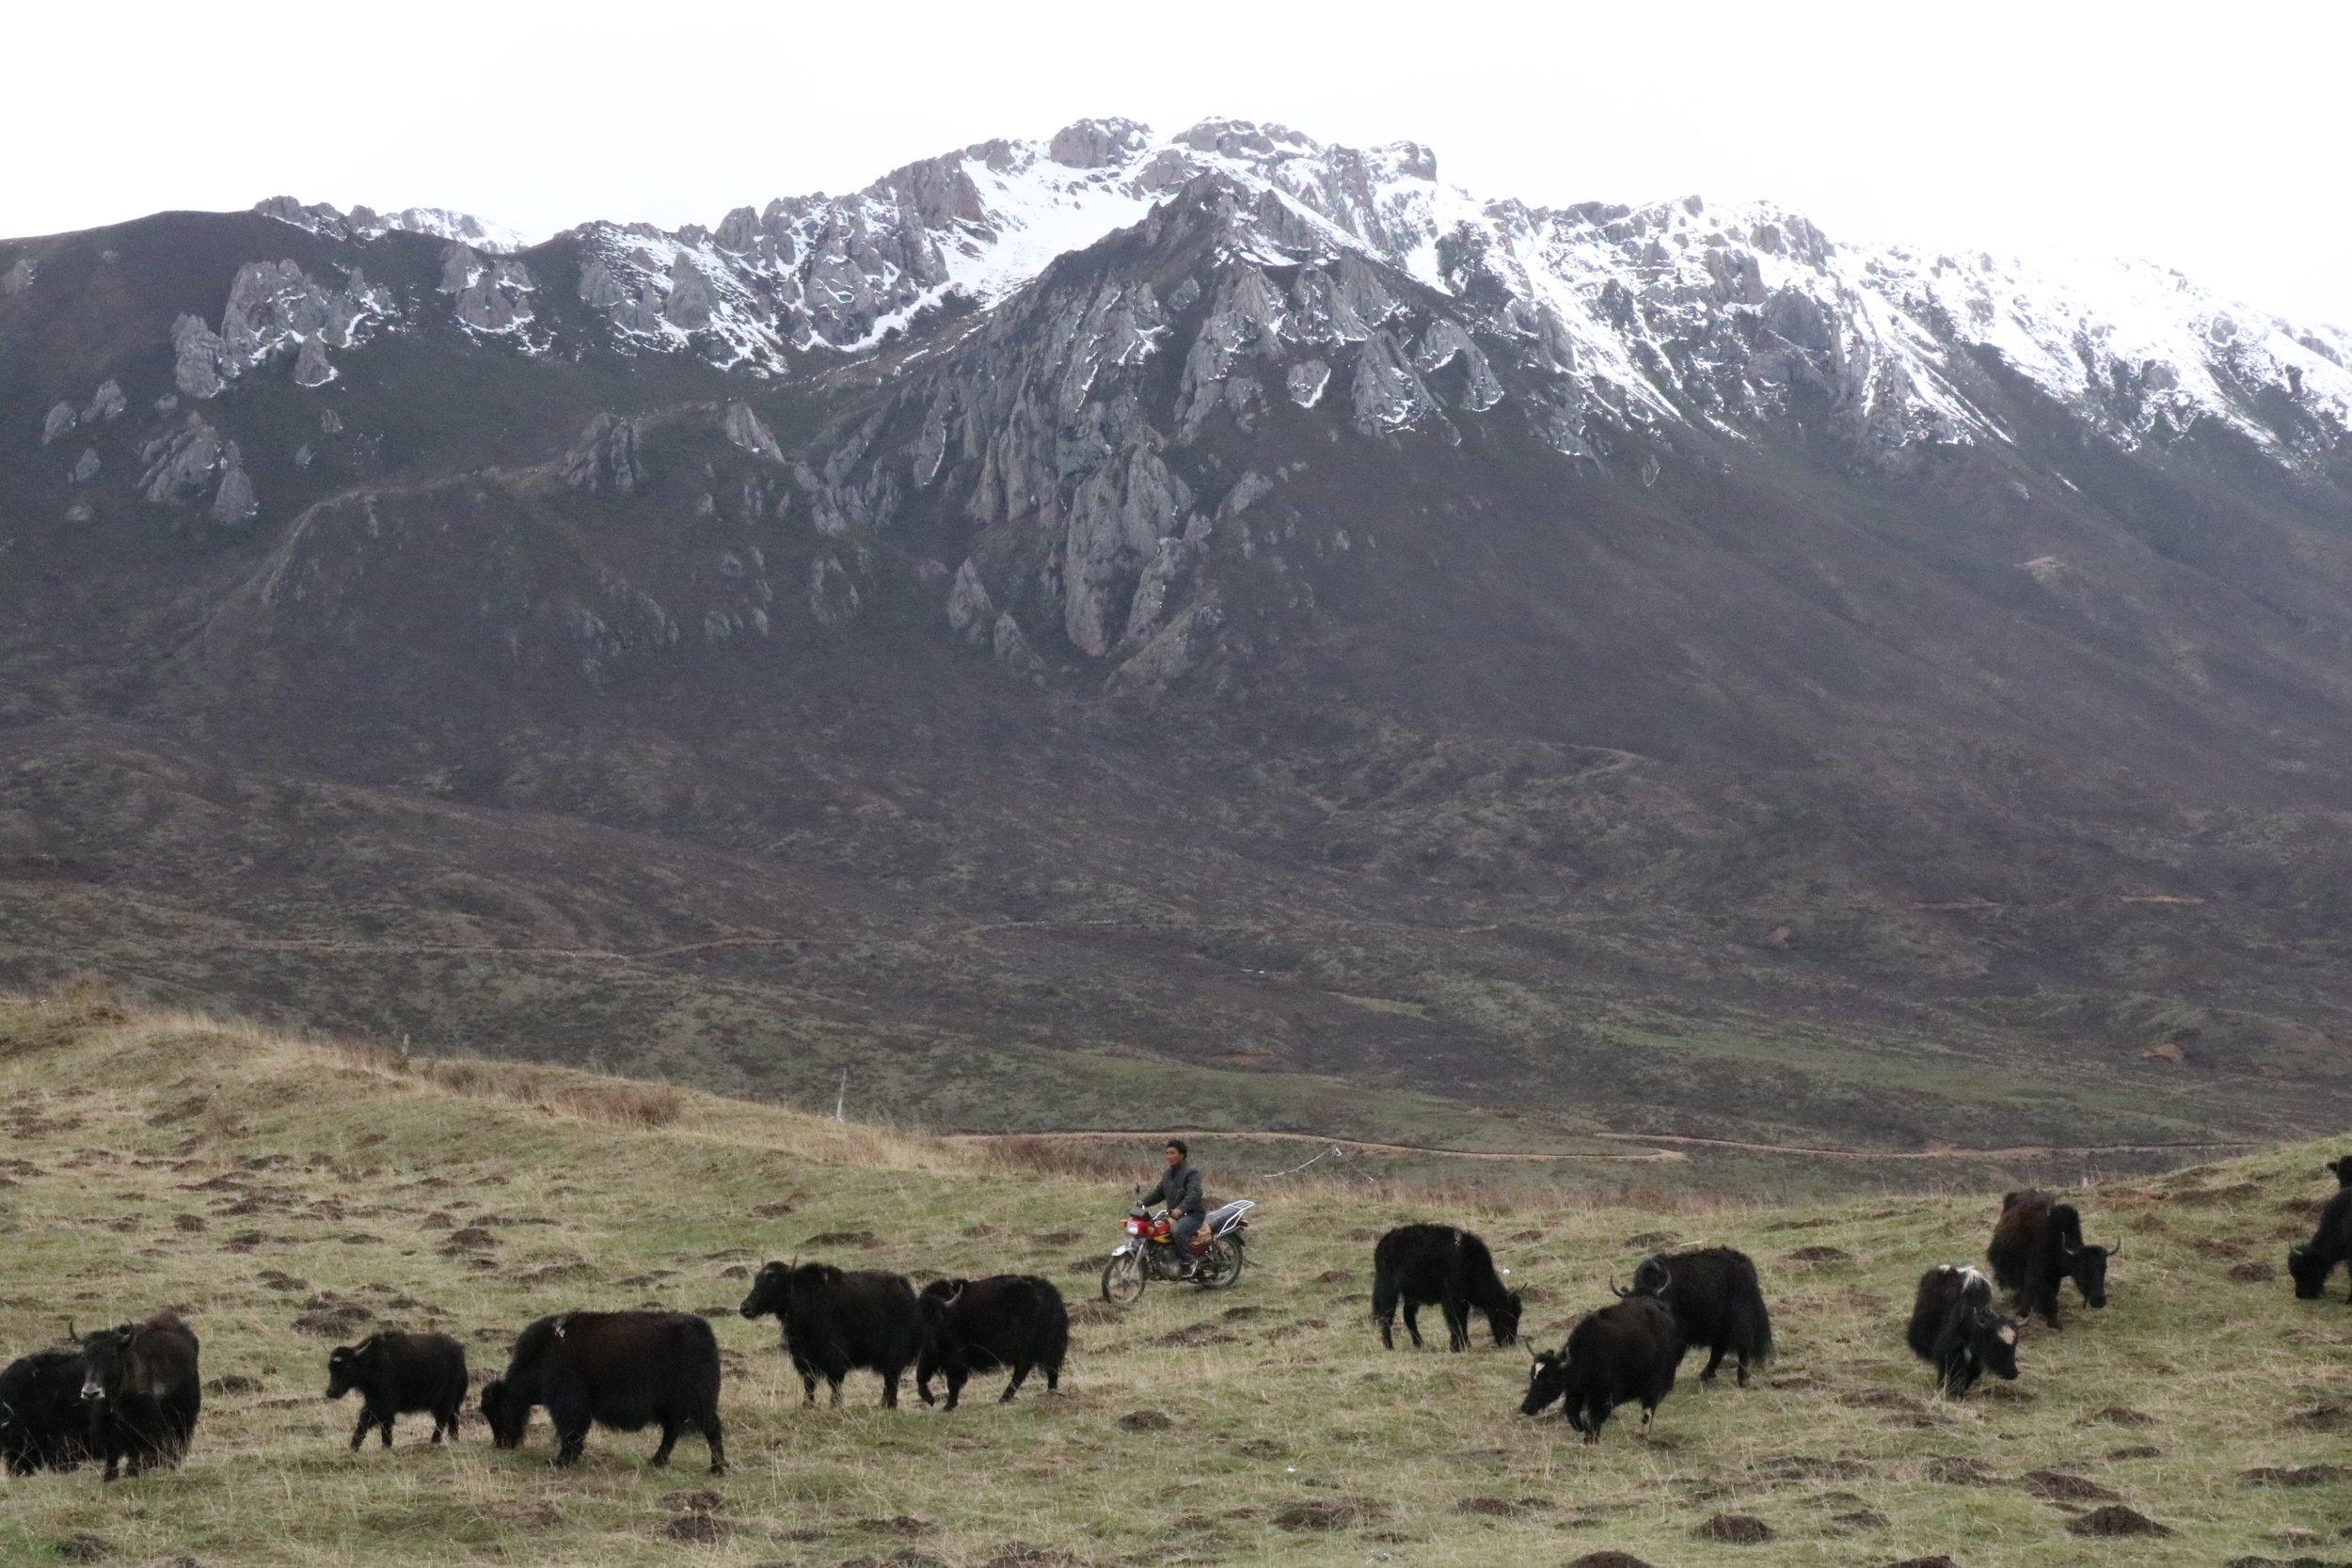 Yaks behind the monastery.